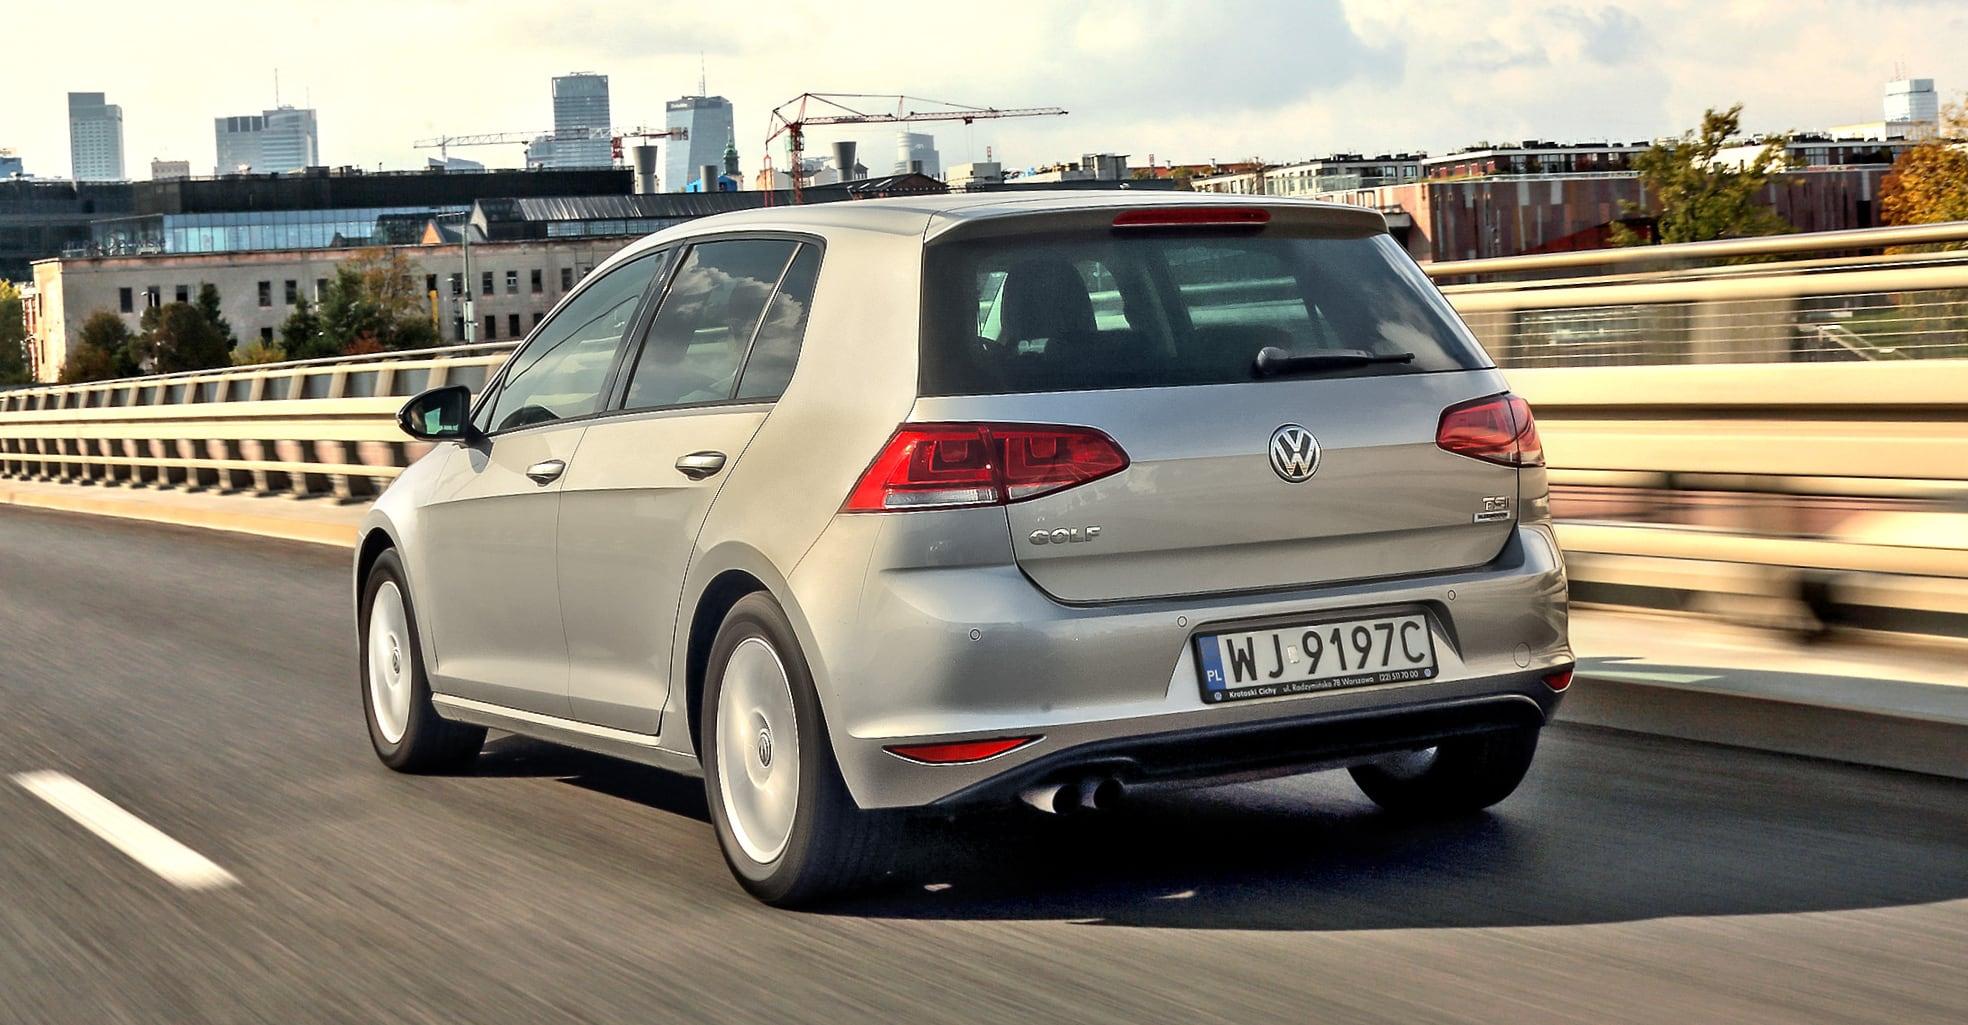 Volkswagen-Golf-VII-1.4-TSI-DSG_3